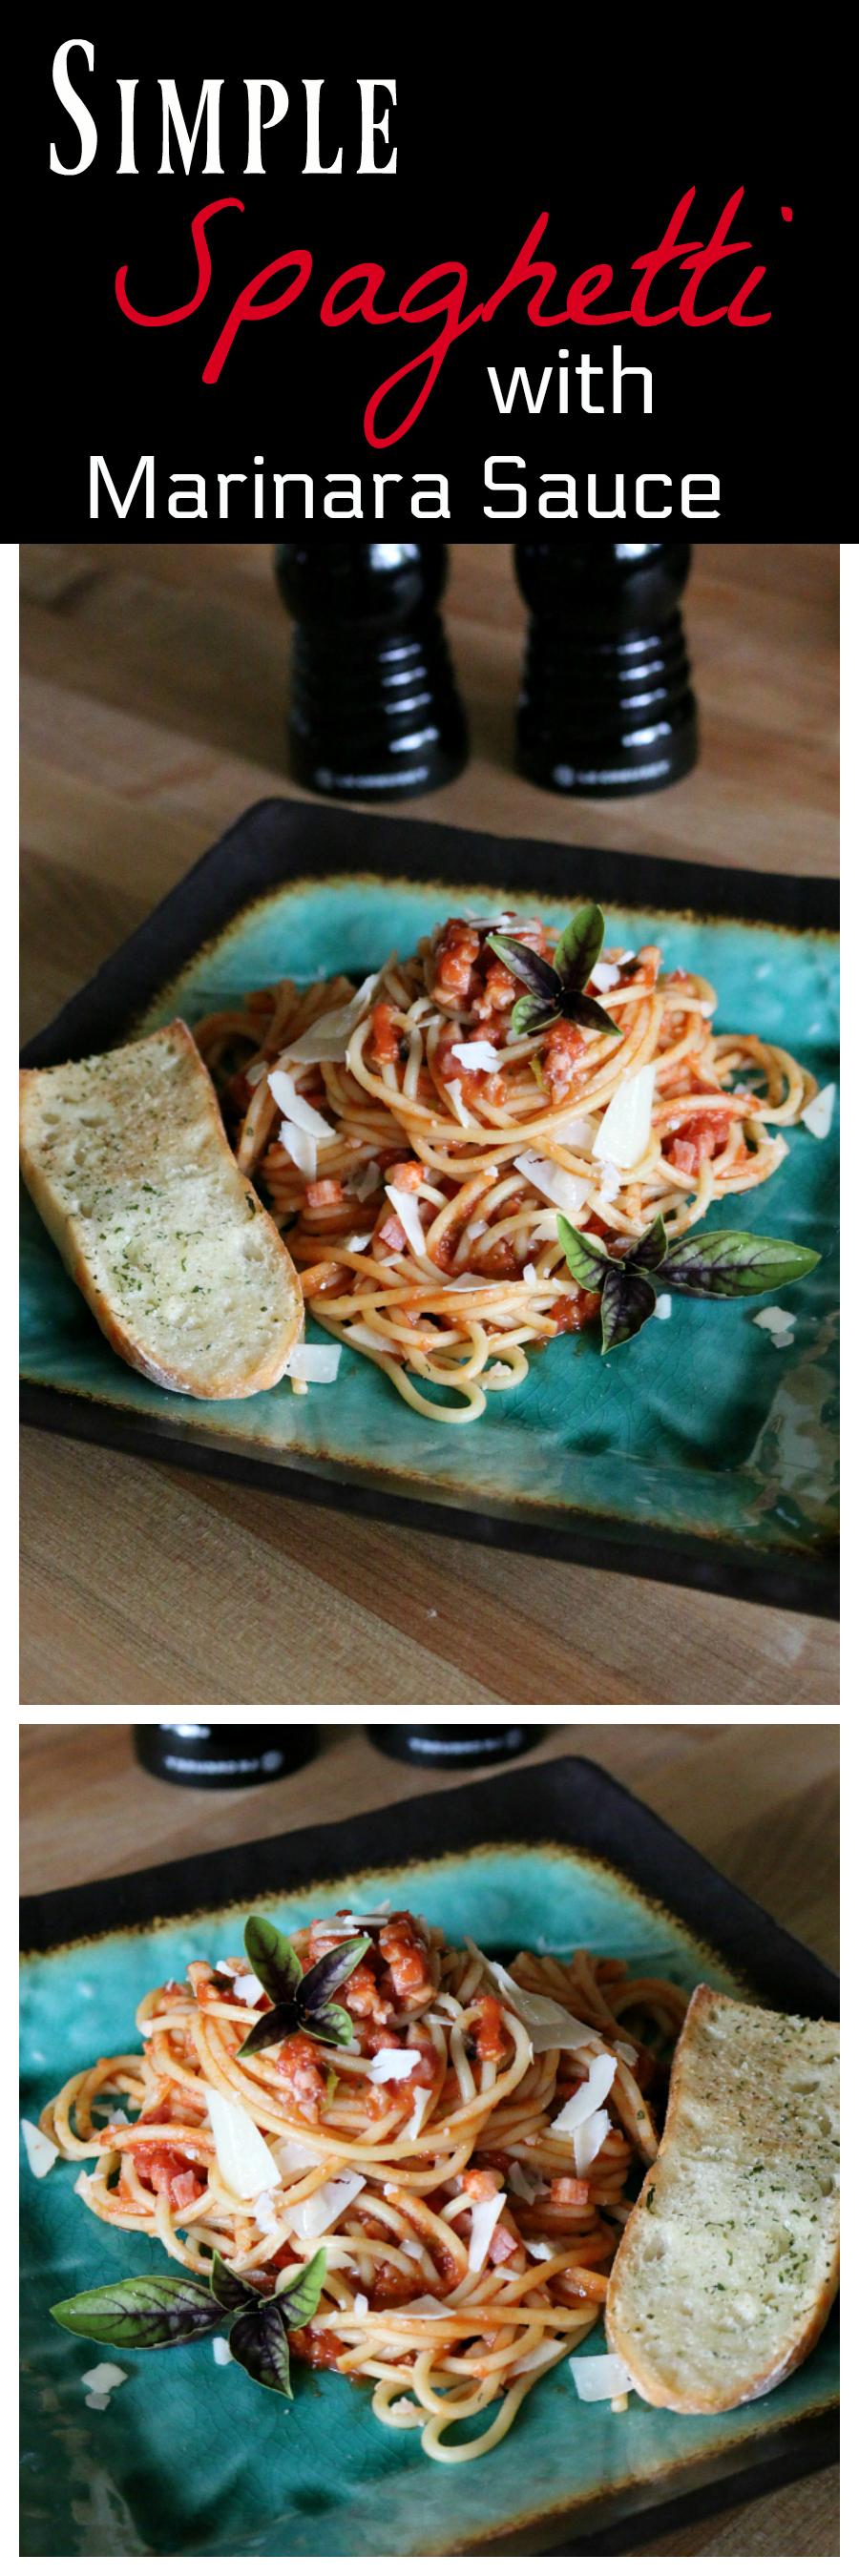 Simple Spaghetti with Marinara Sauce CeceliasGoodStuff.com Good Food for Good People